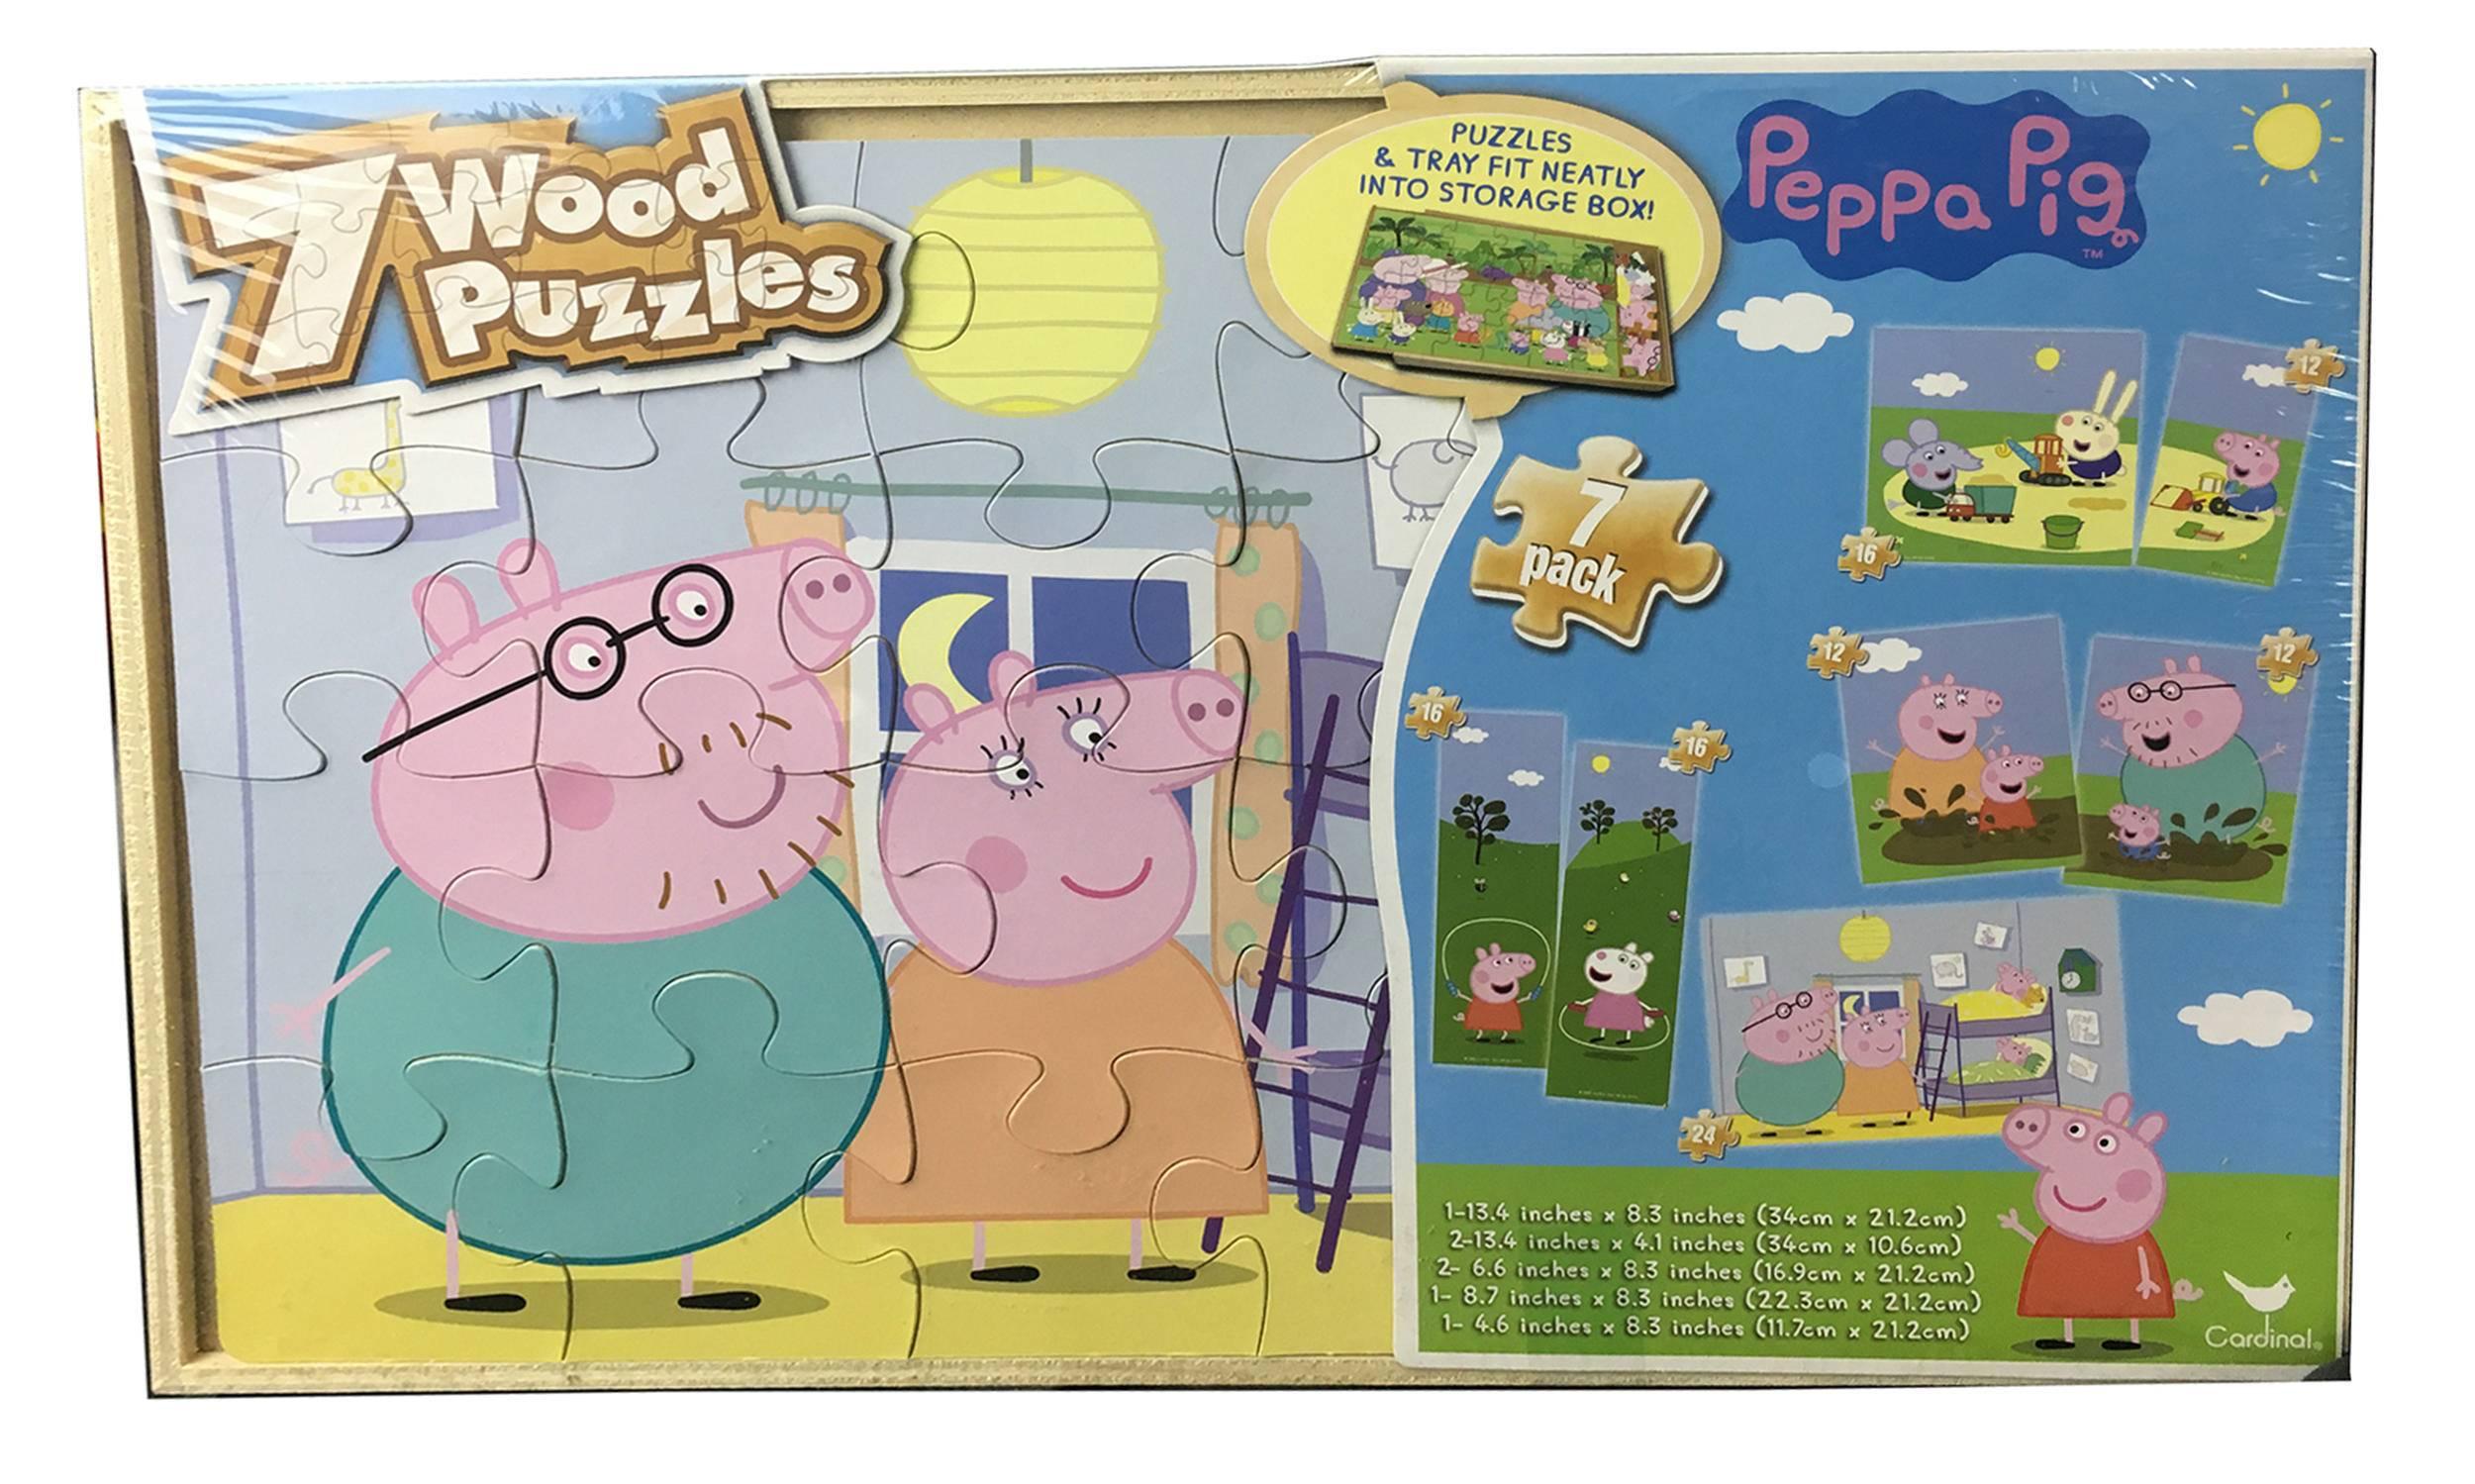 ... //truimg.toysrus.com/product/images/peppa- ...  sc 1 st  Imagelicious & Peppa Pig Storage Box 7L   Imagelicious